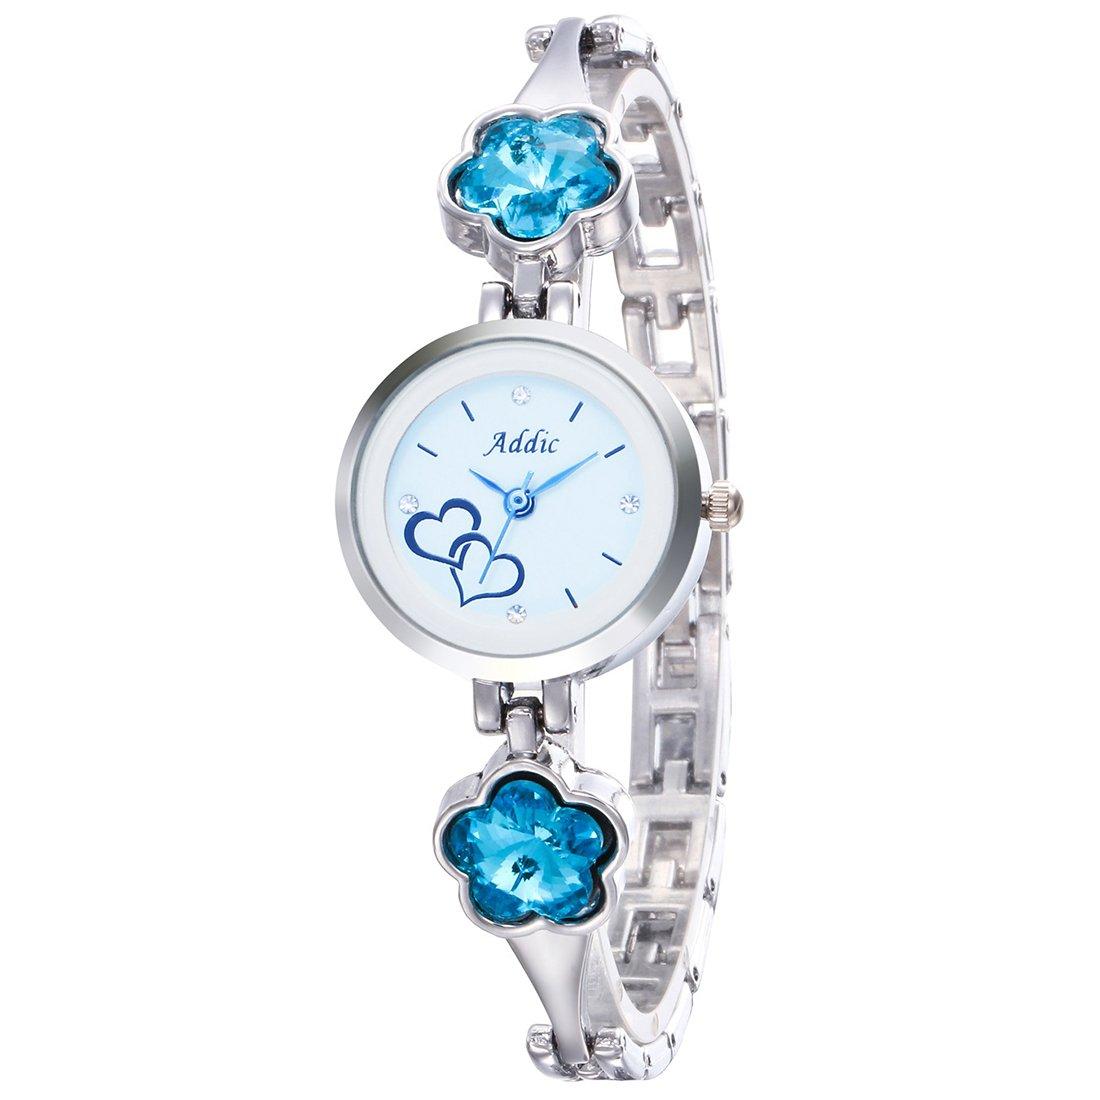 Addic Analog White Dial Women's Watch-AddicWW449